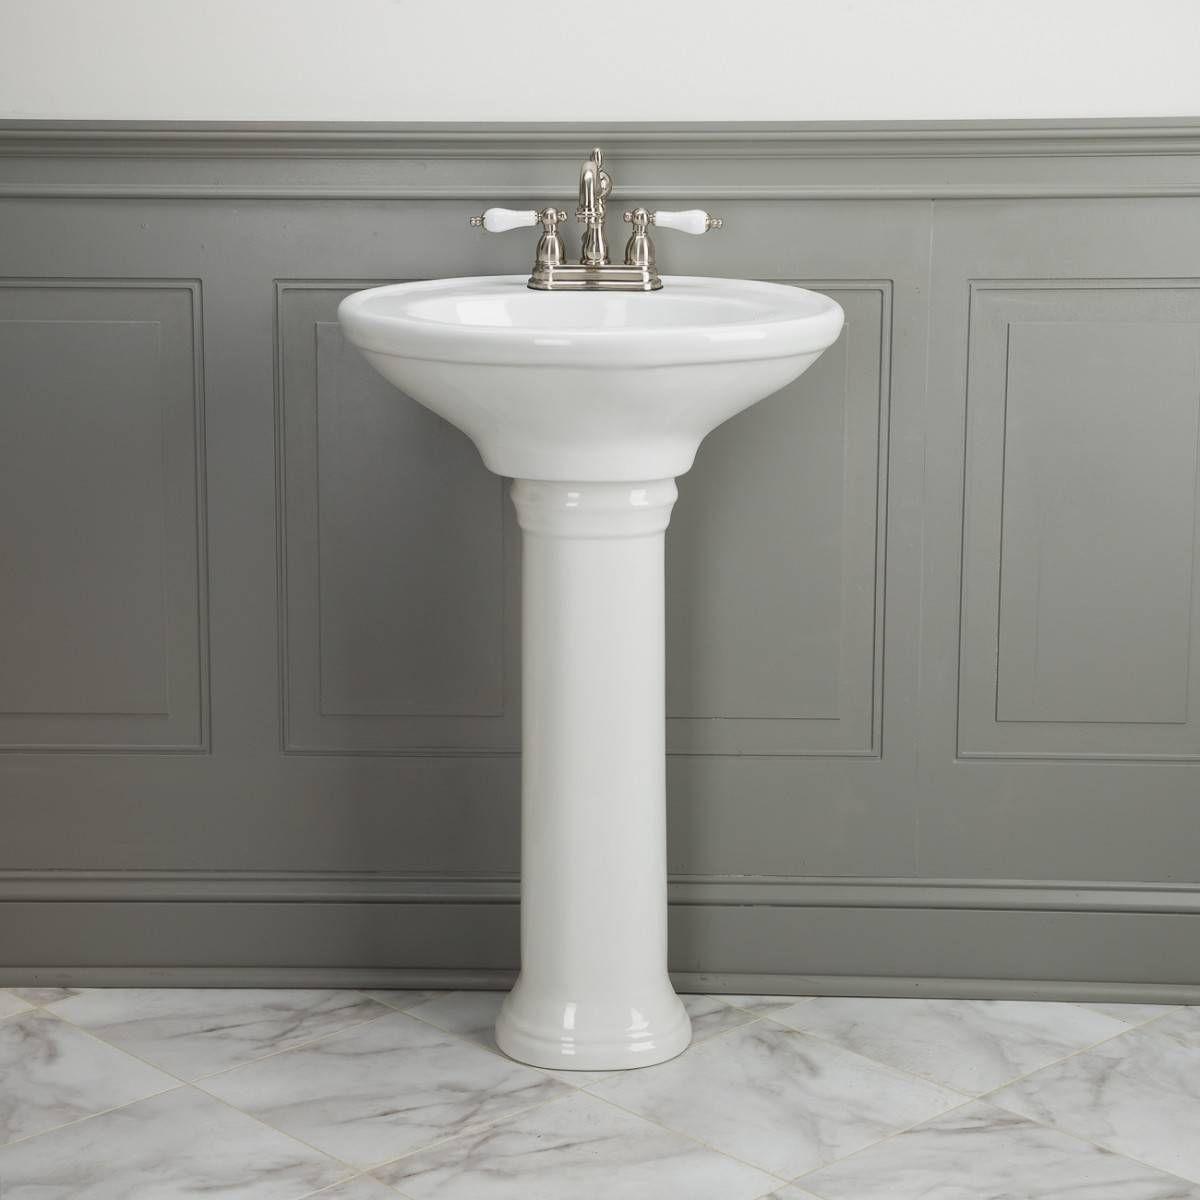 Randolph Morris Petitie 21 Inch Pedestal Sink Pedestal Sink